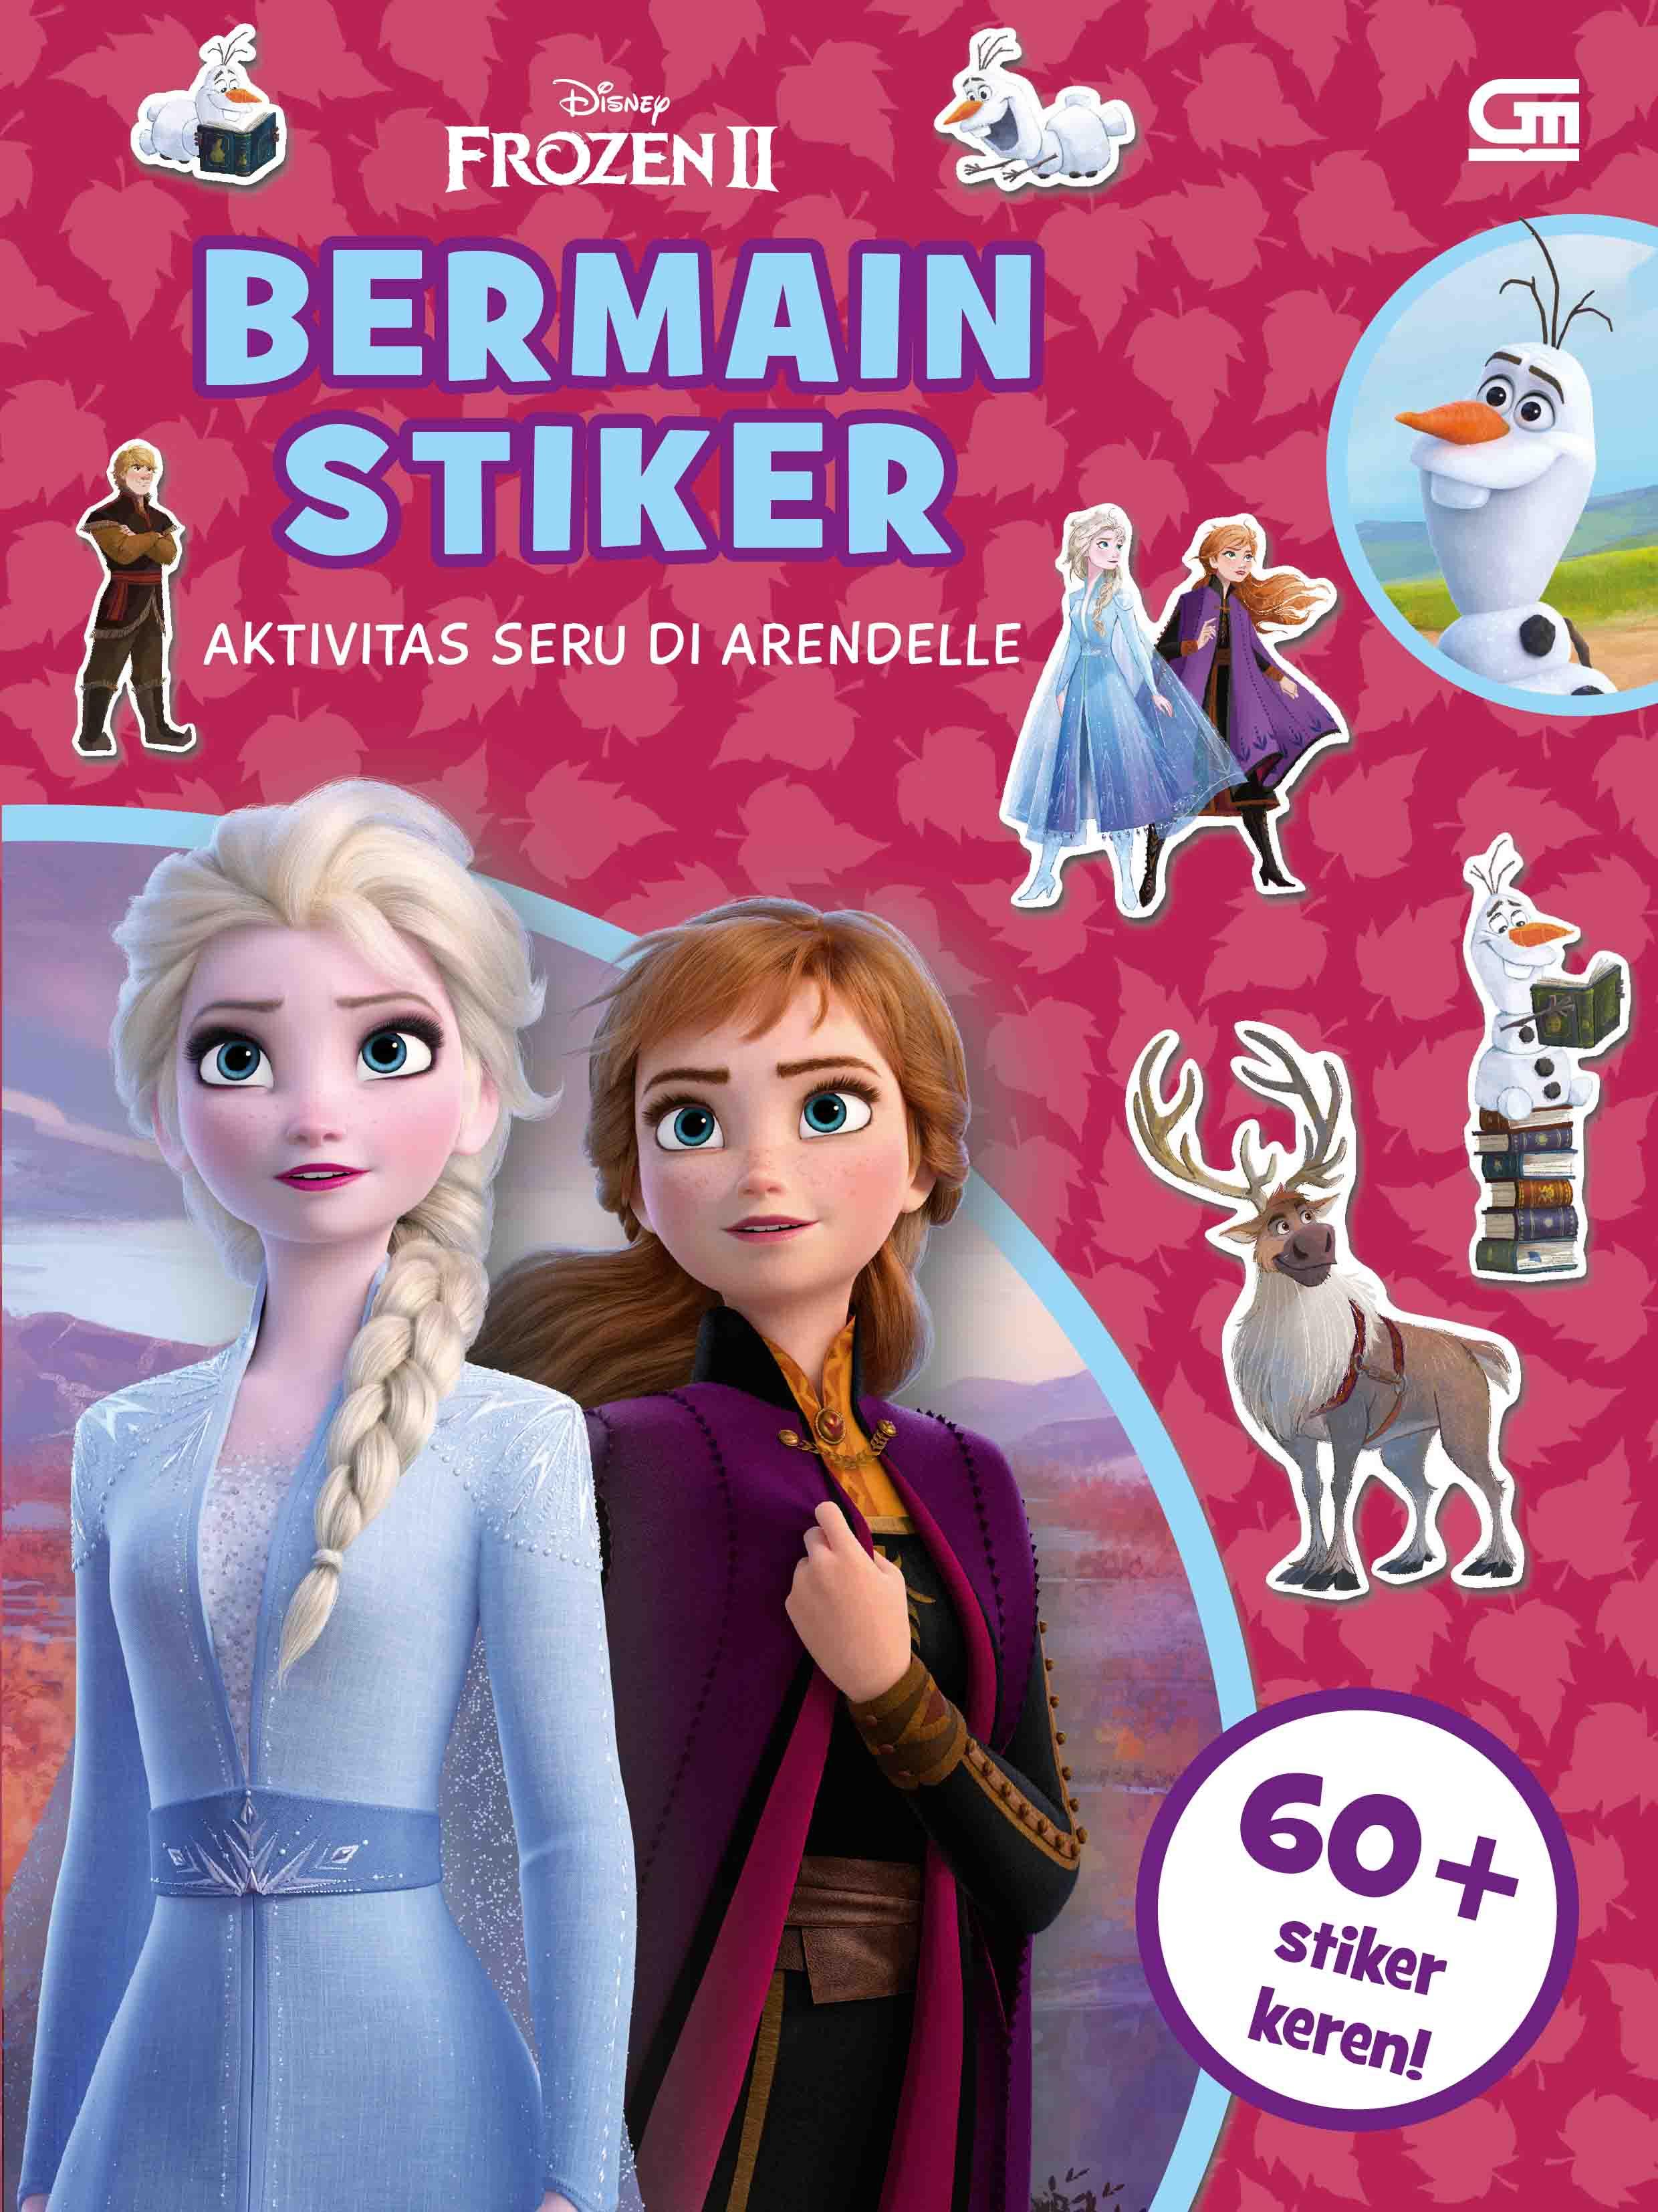 Frozen II: Bermain Stiker: Aktivitas Seru di Arendelle